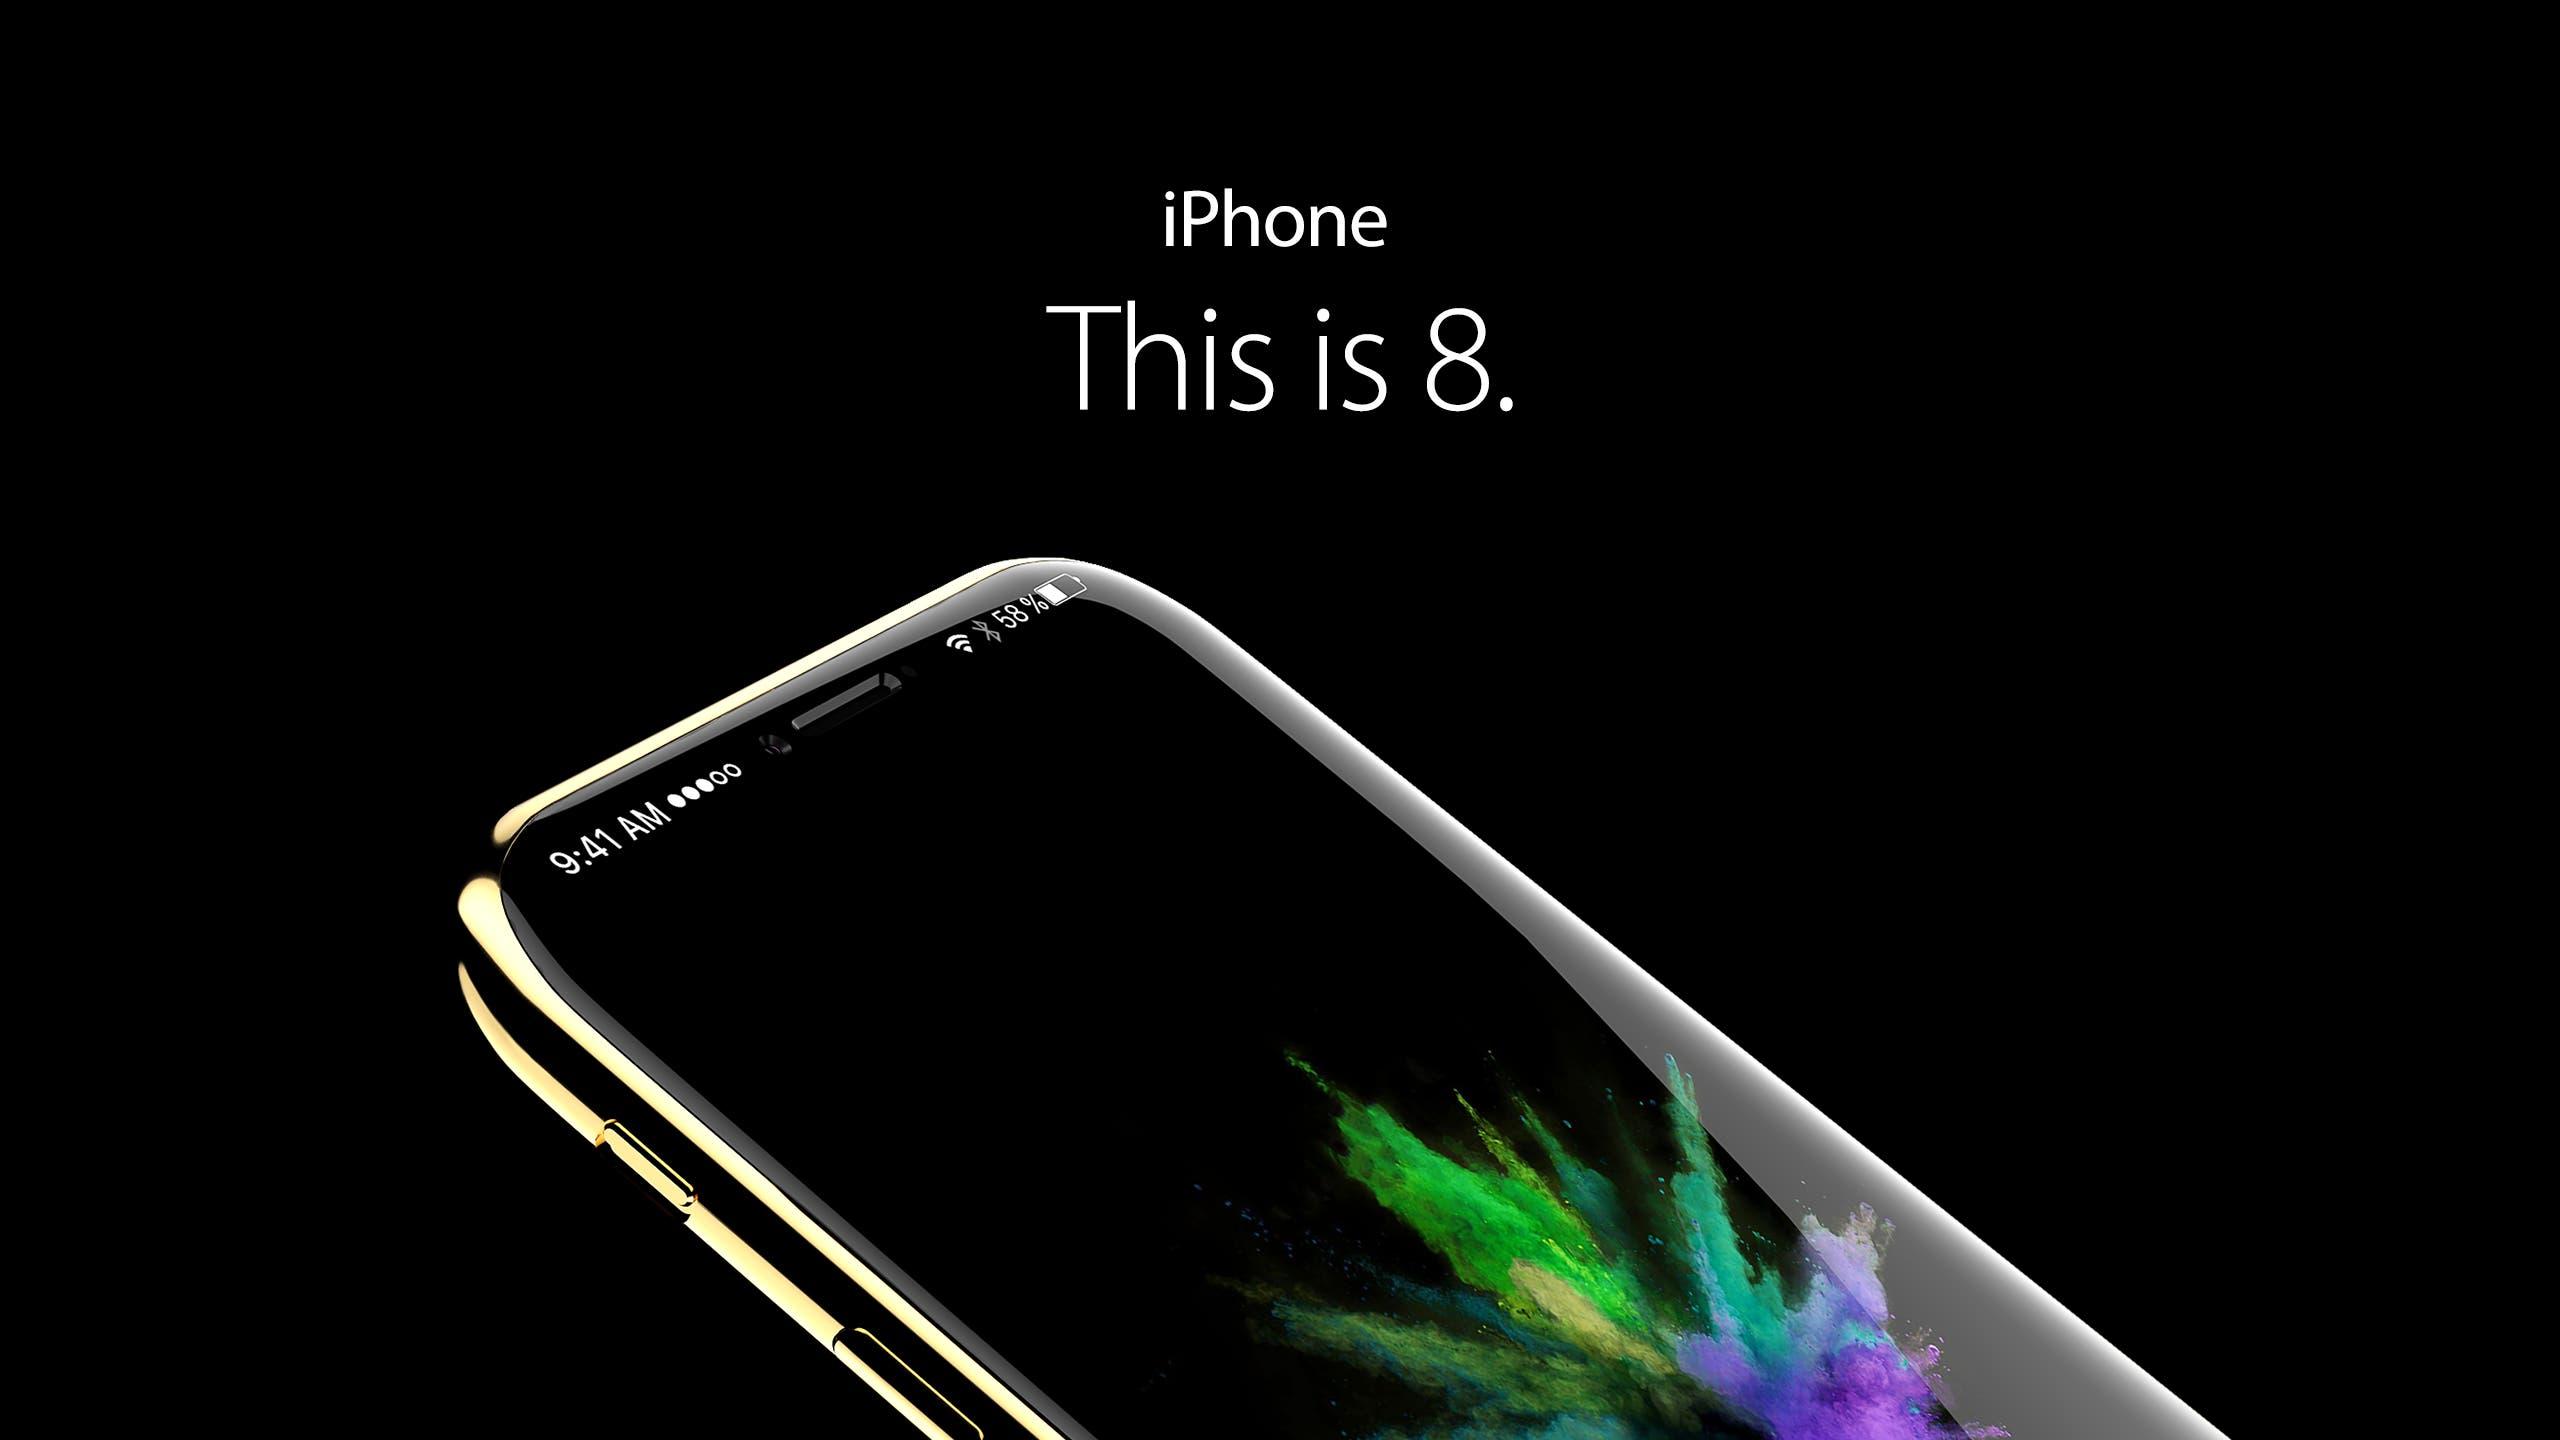 iPhone 8 Concept